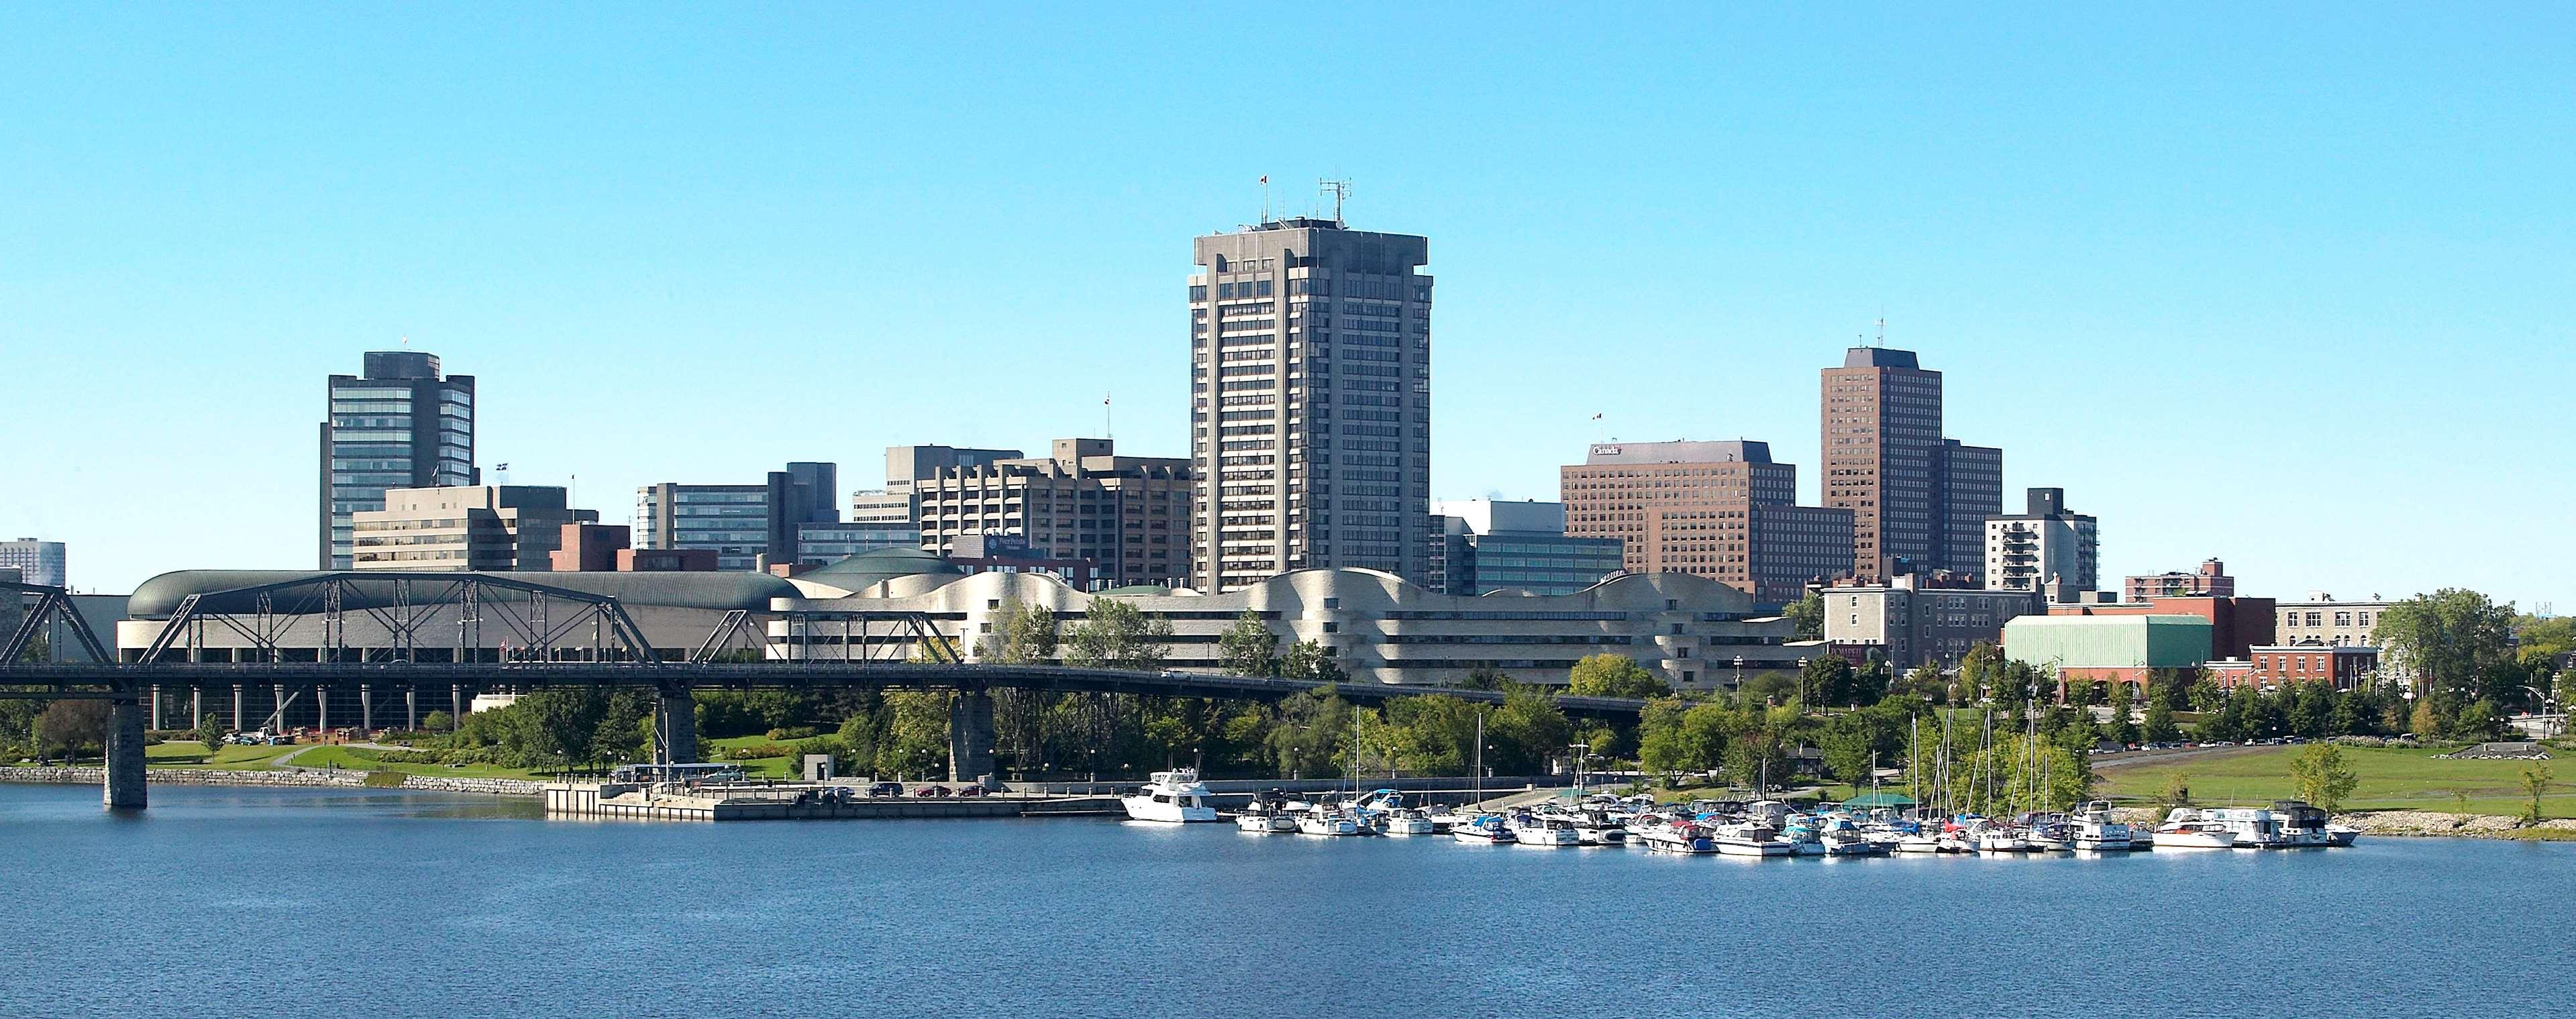 Four Points by Sheraton Hotel & Conference Centre Gatineau-Ottawa à Gatineau: View 1